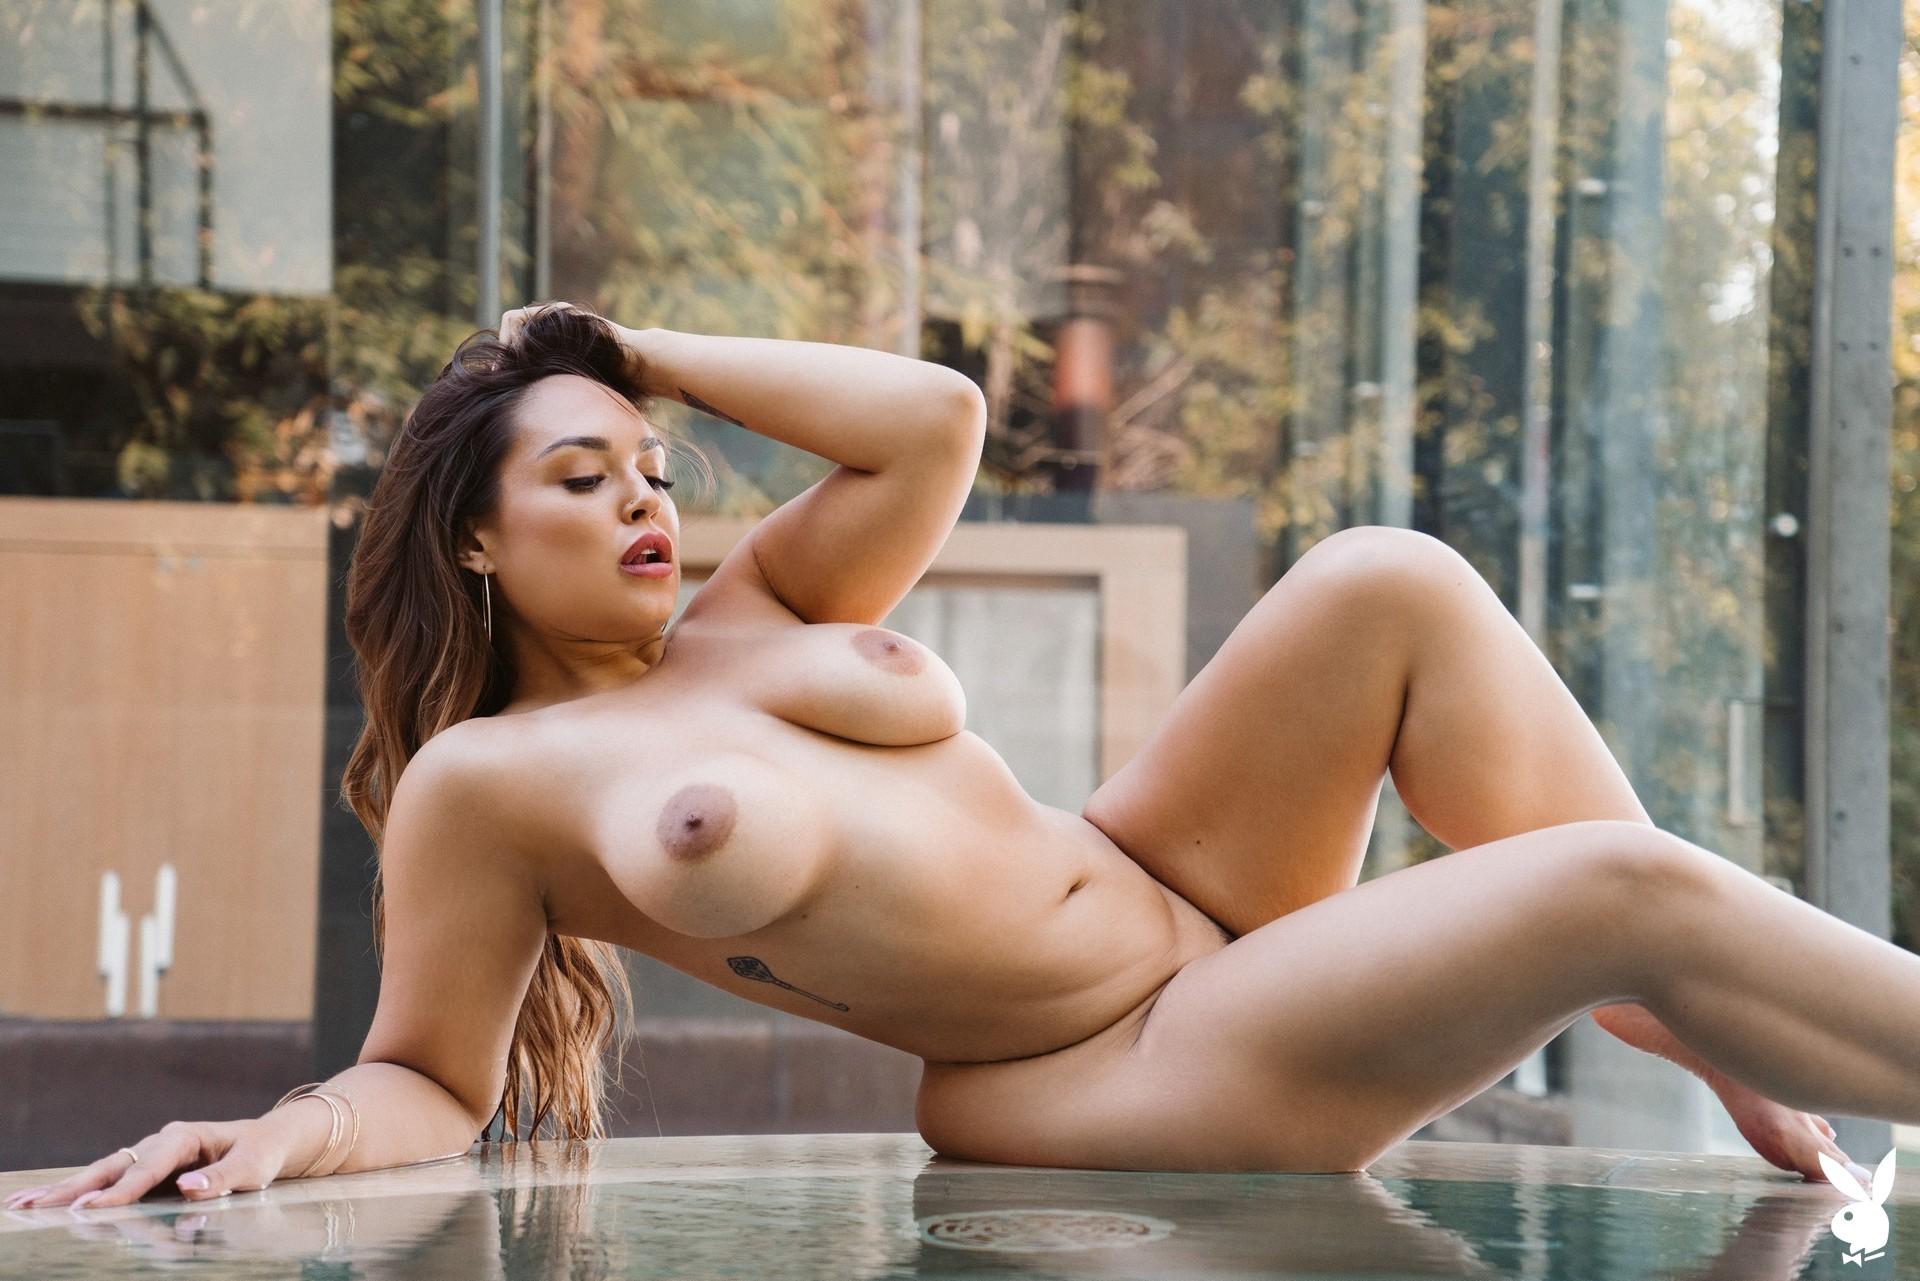 Sophia Grey In Different View Playboy Plus (25)